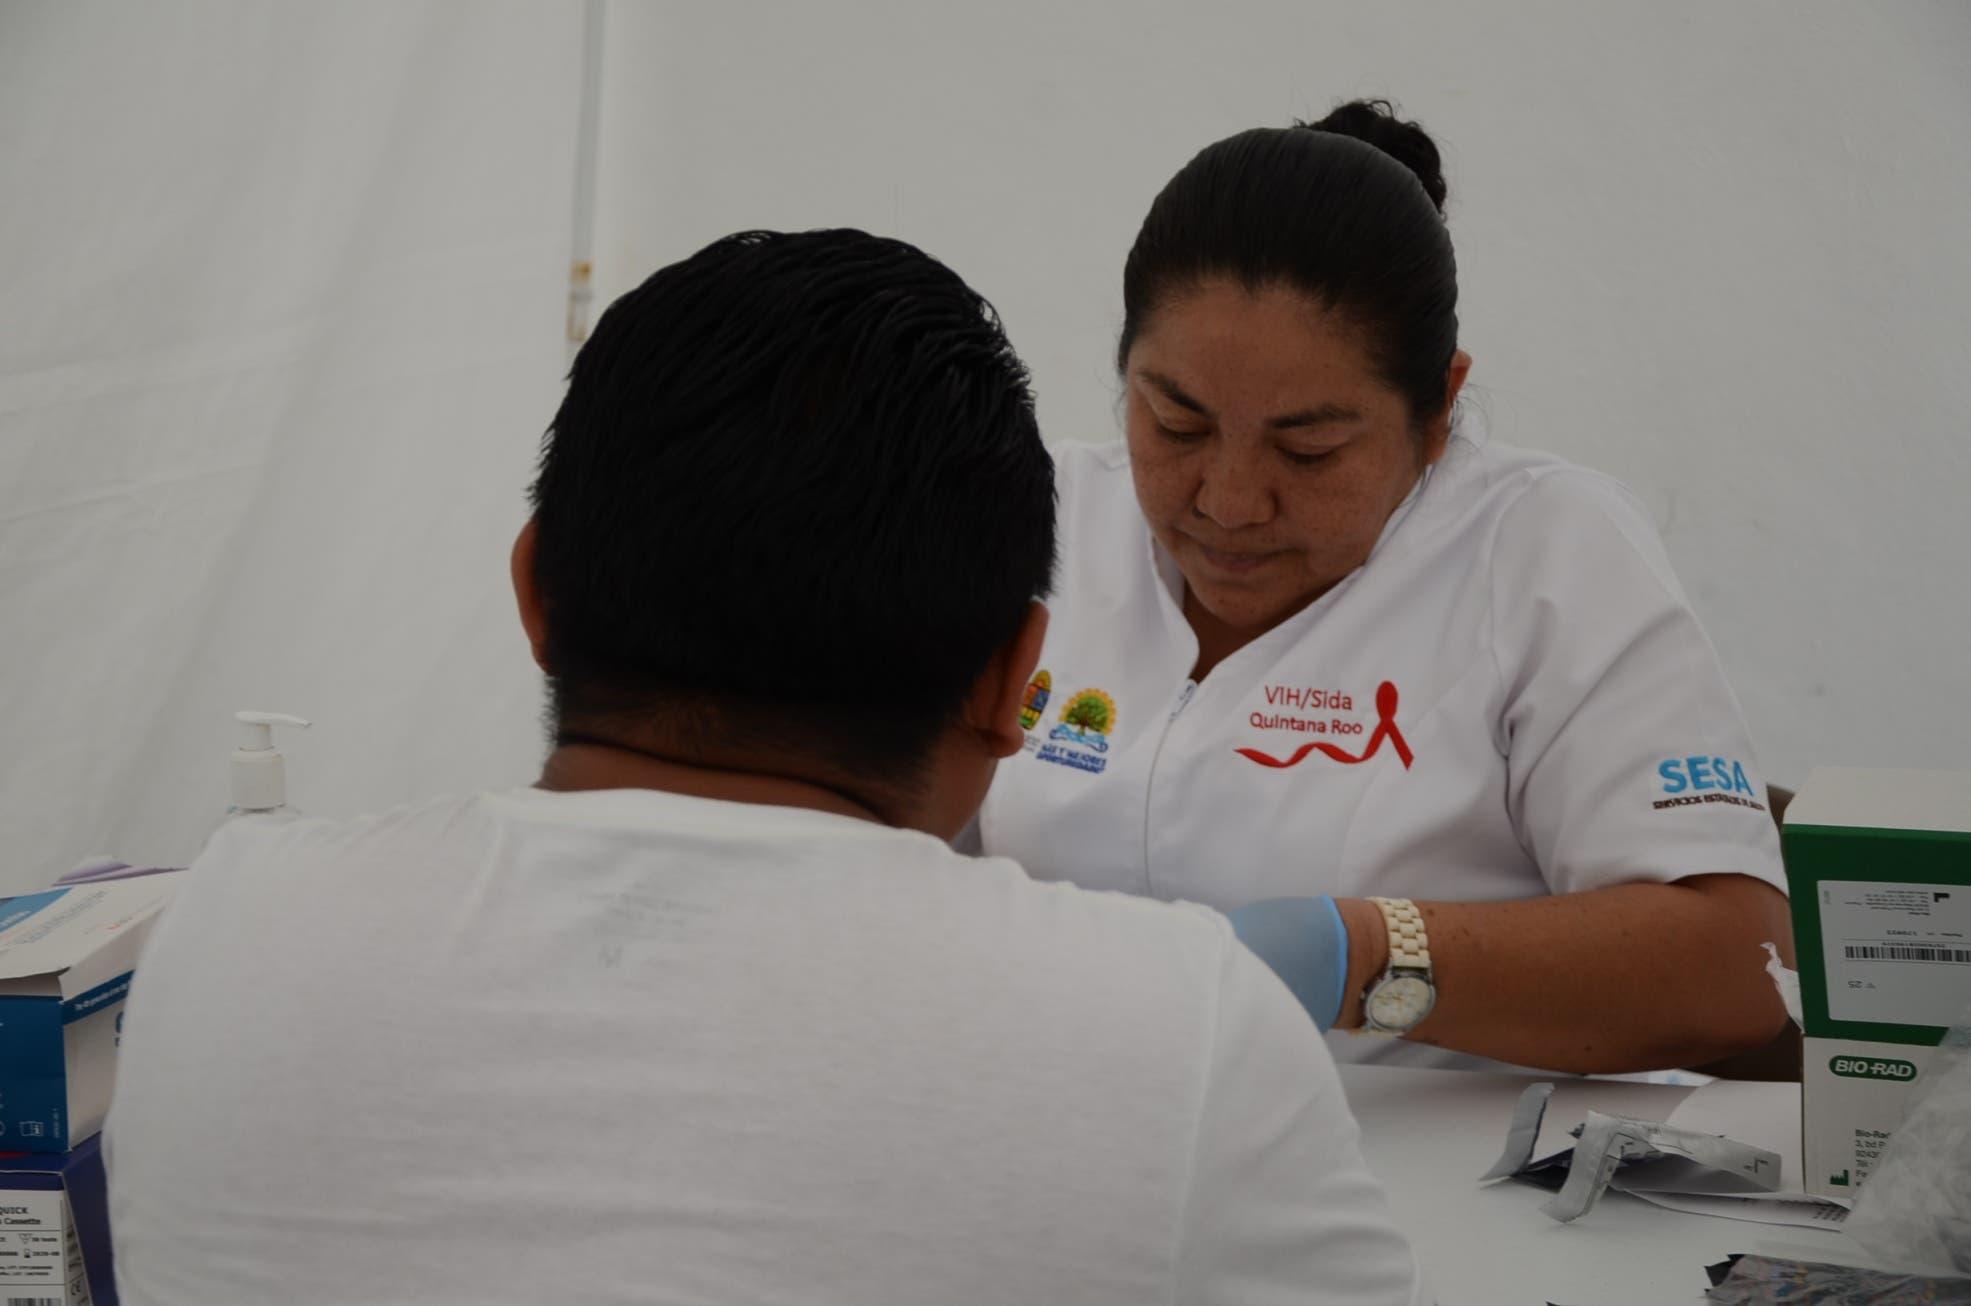 SESA realiza pruebas para detectar el VIH.